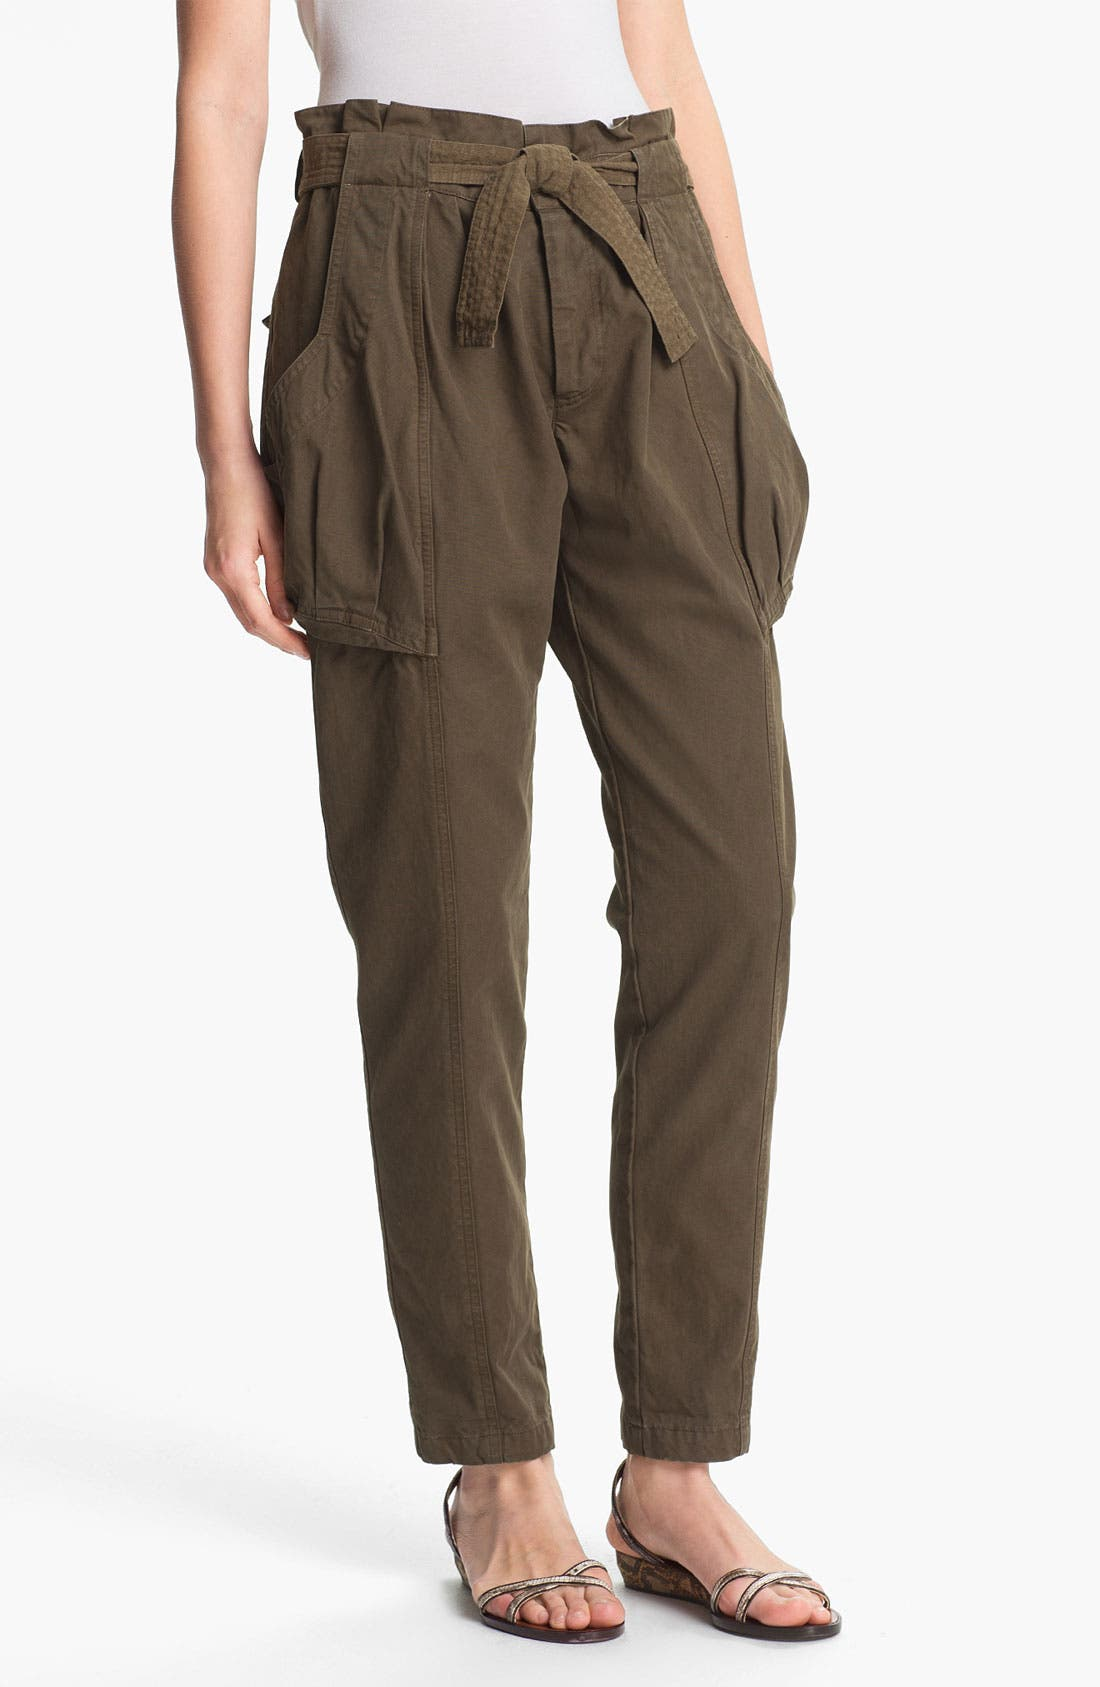 Alternate Image 1 Selected - A.L.C. 'Randall' Pants